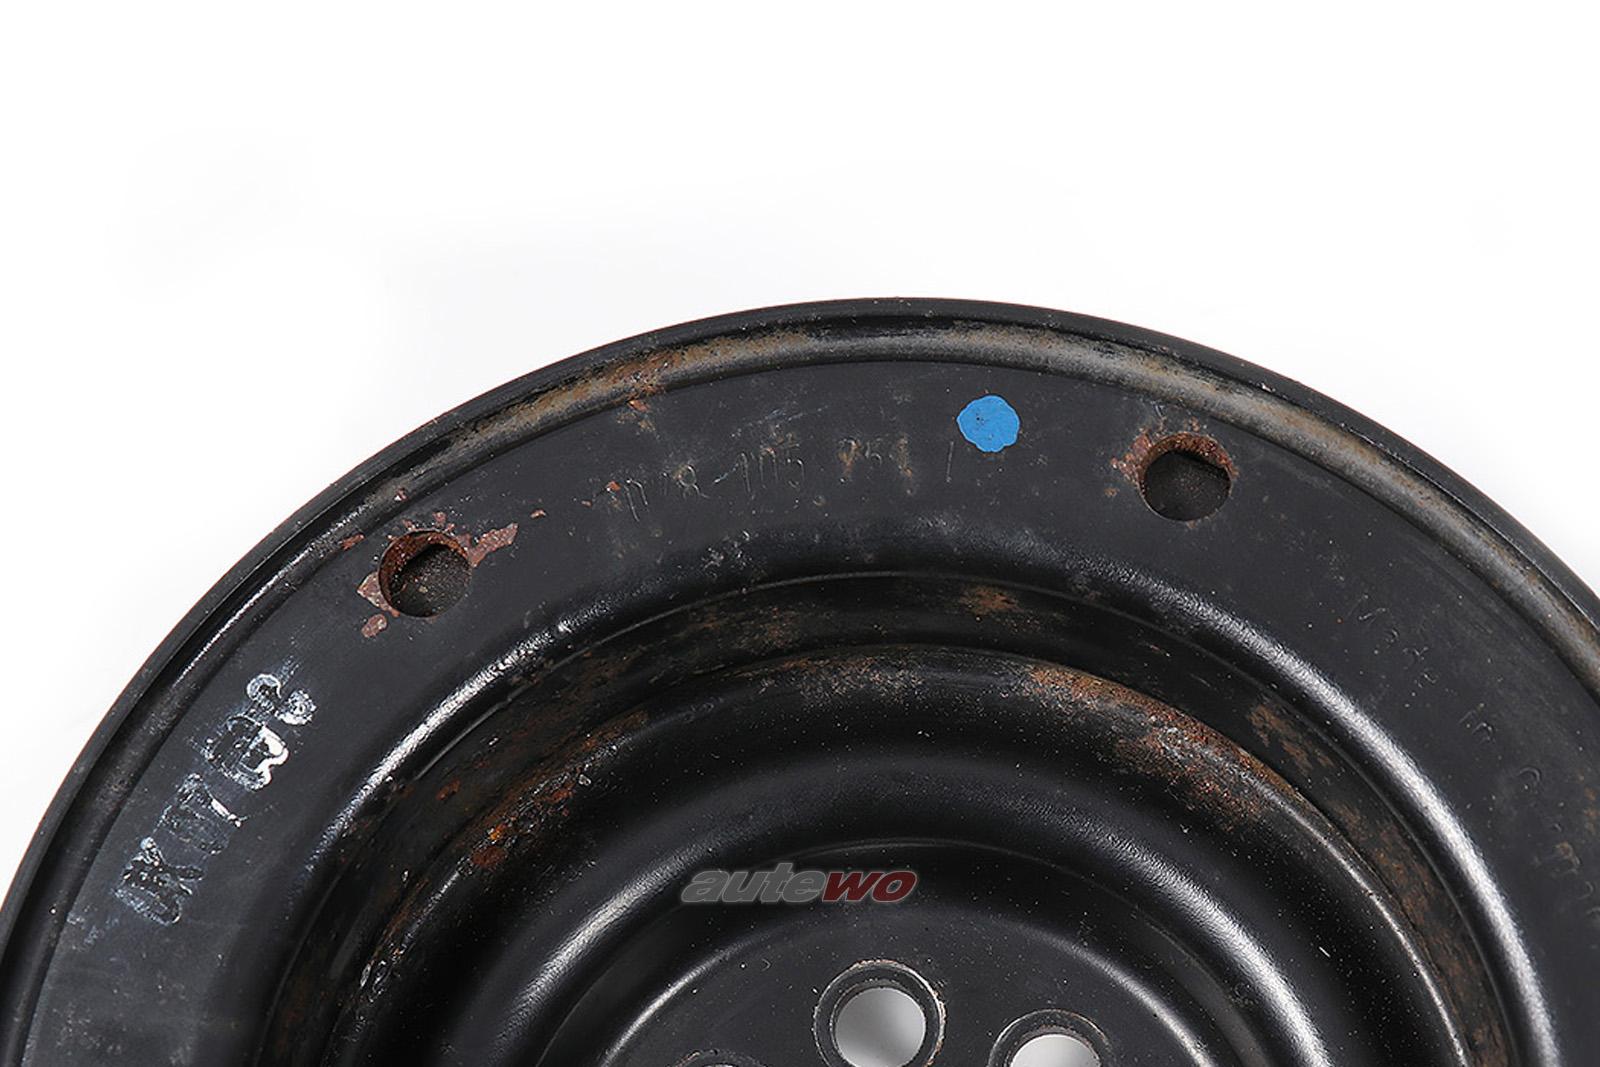 Schwingungsdämpfer Kurbelwelle VW Audi 2.8 V6 078105251L